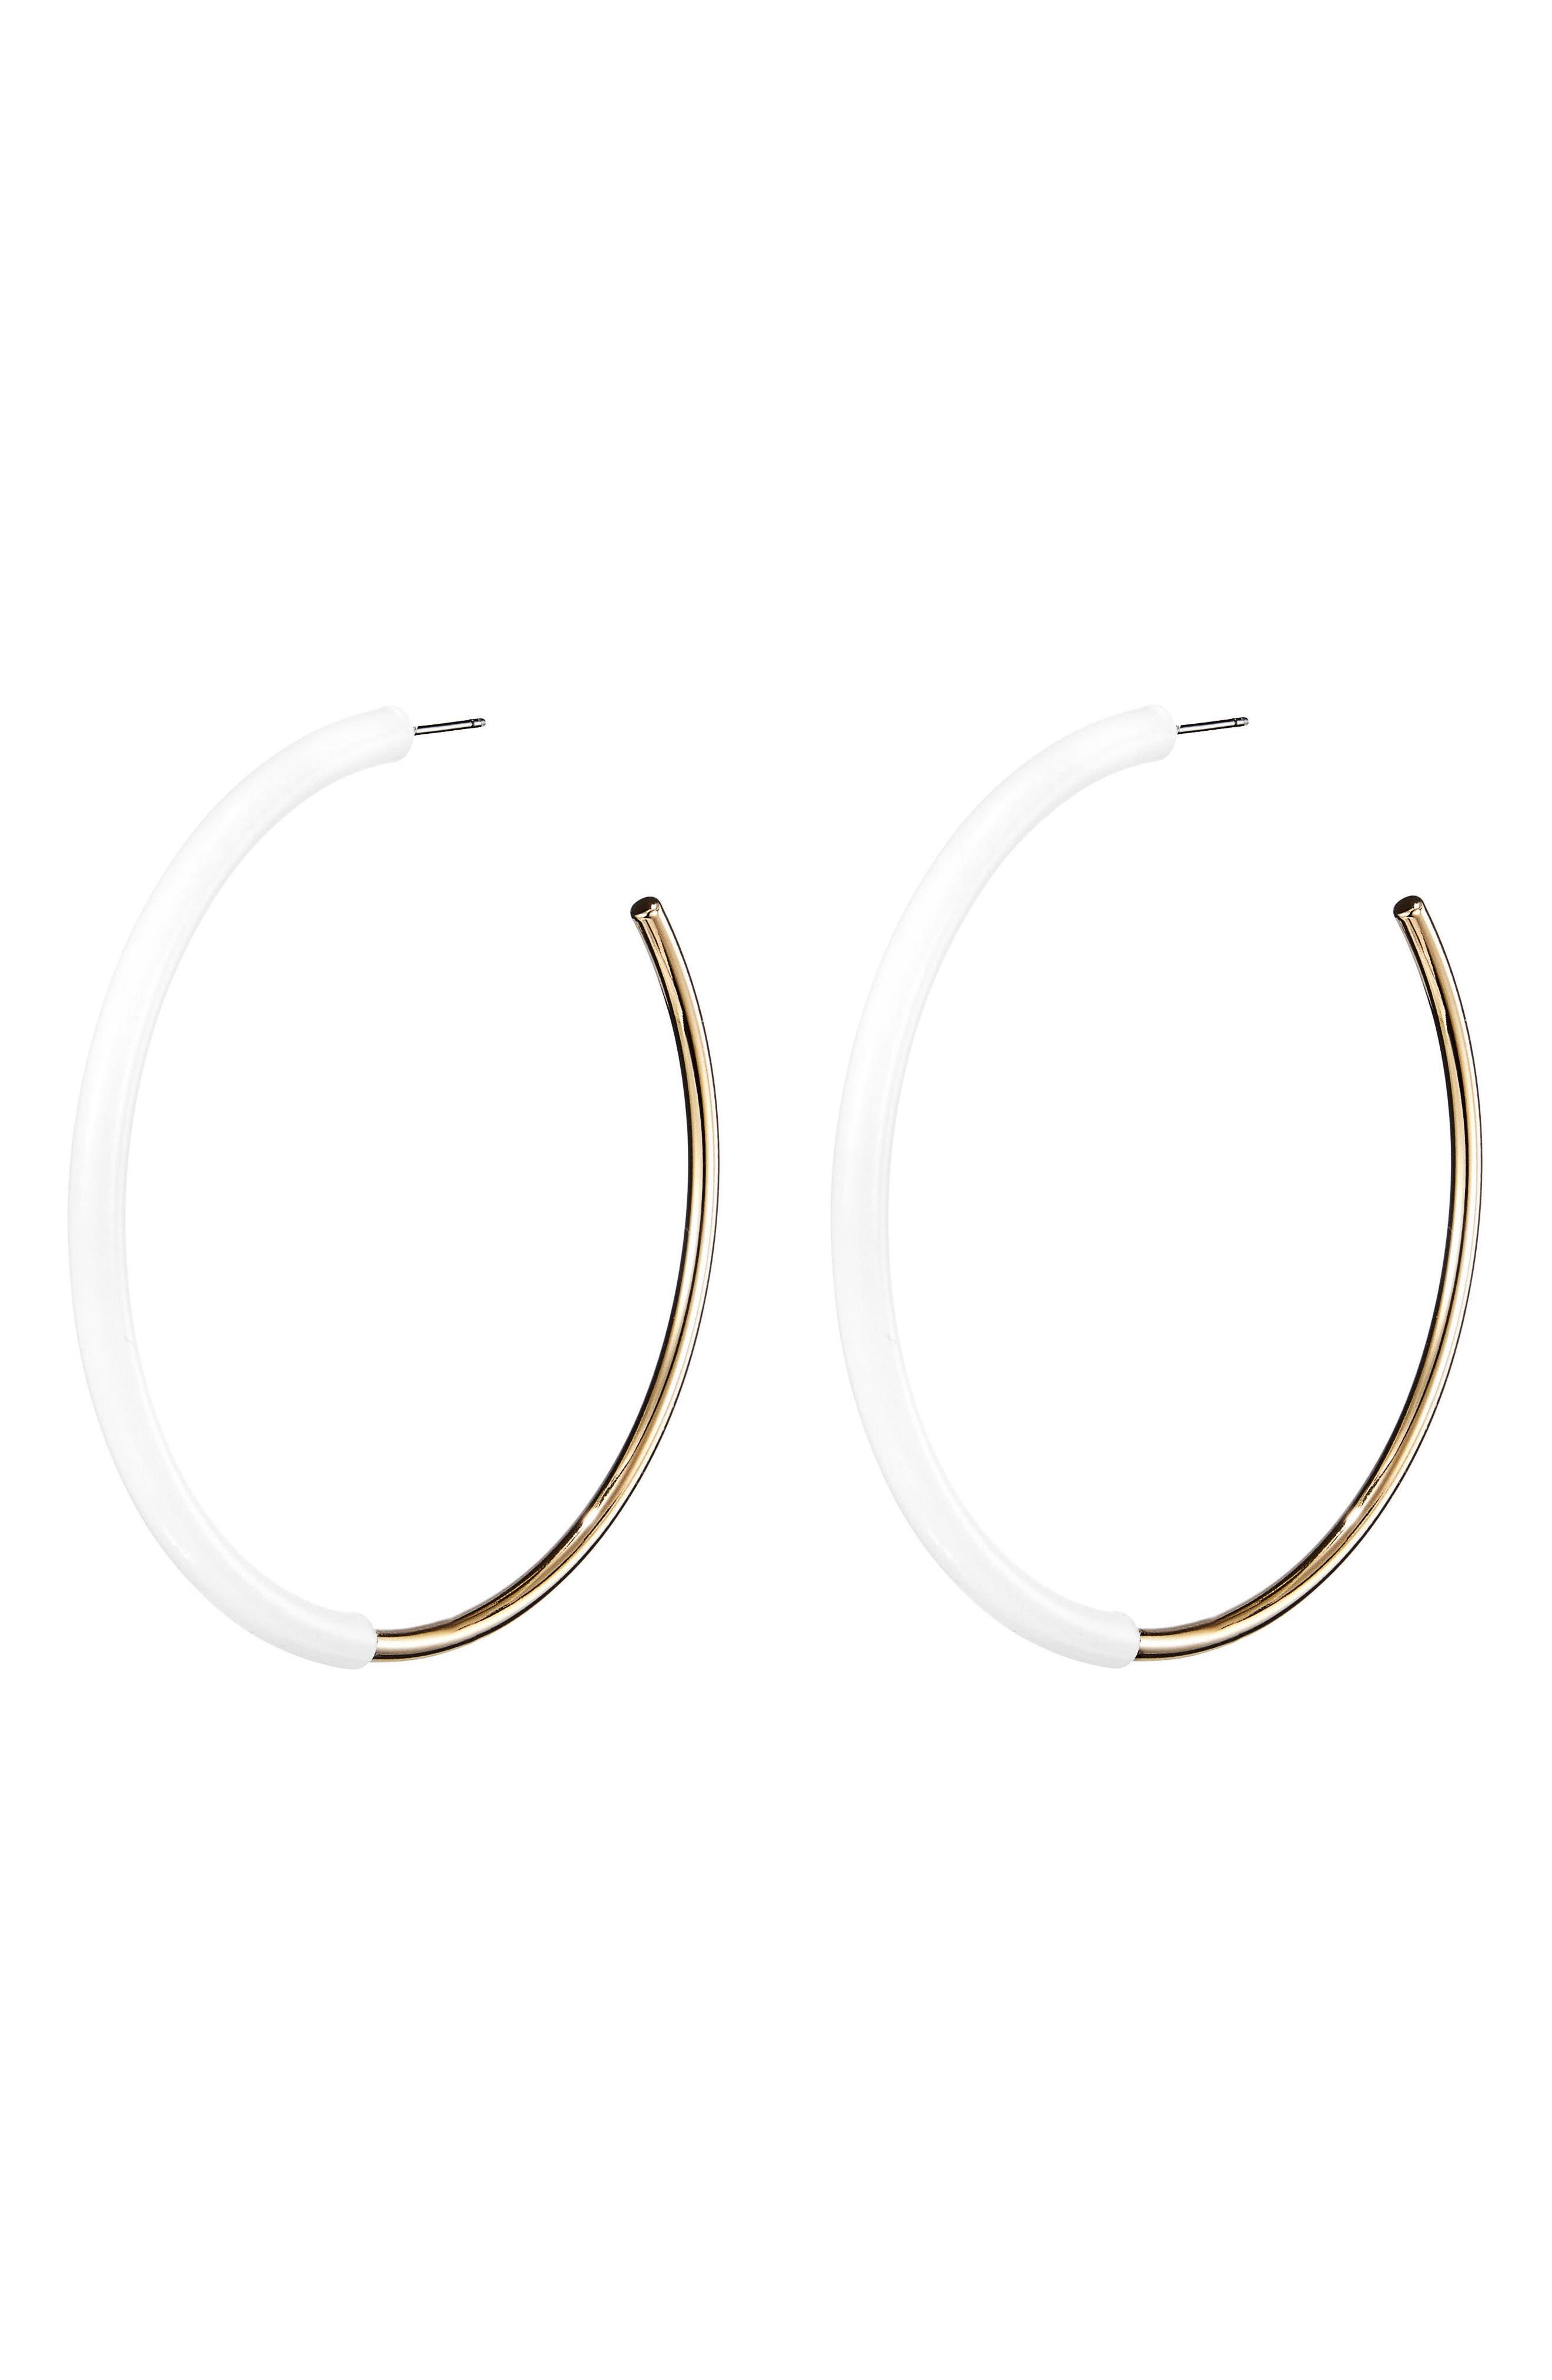 Lola Large Hoop Earrings,                             Alternate thumbnail 4, color,                             Gold/ White